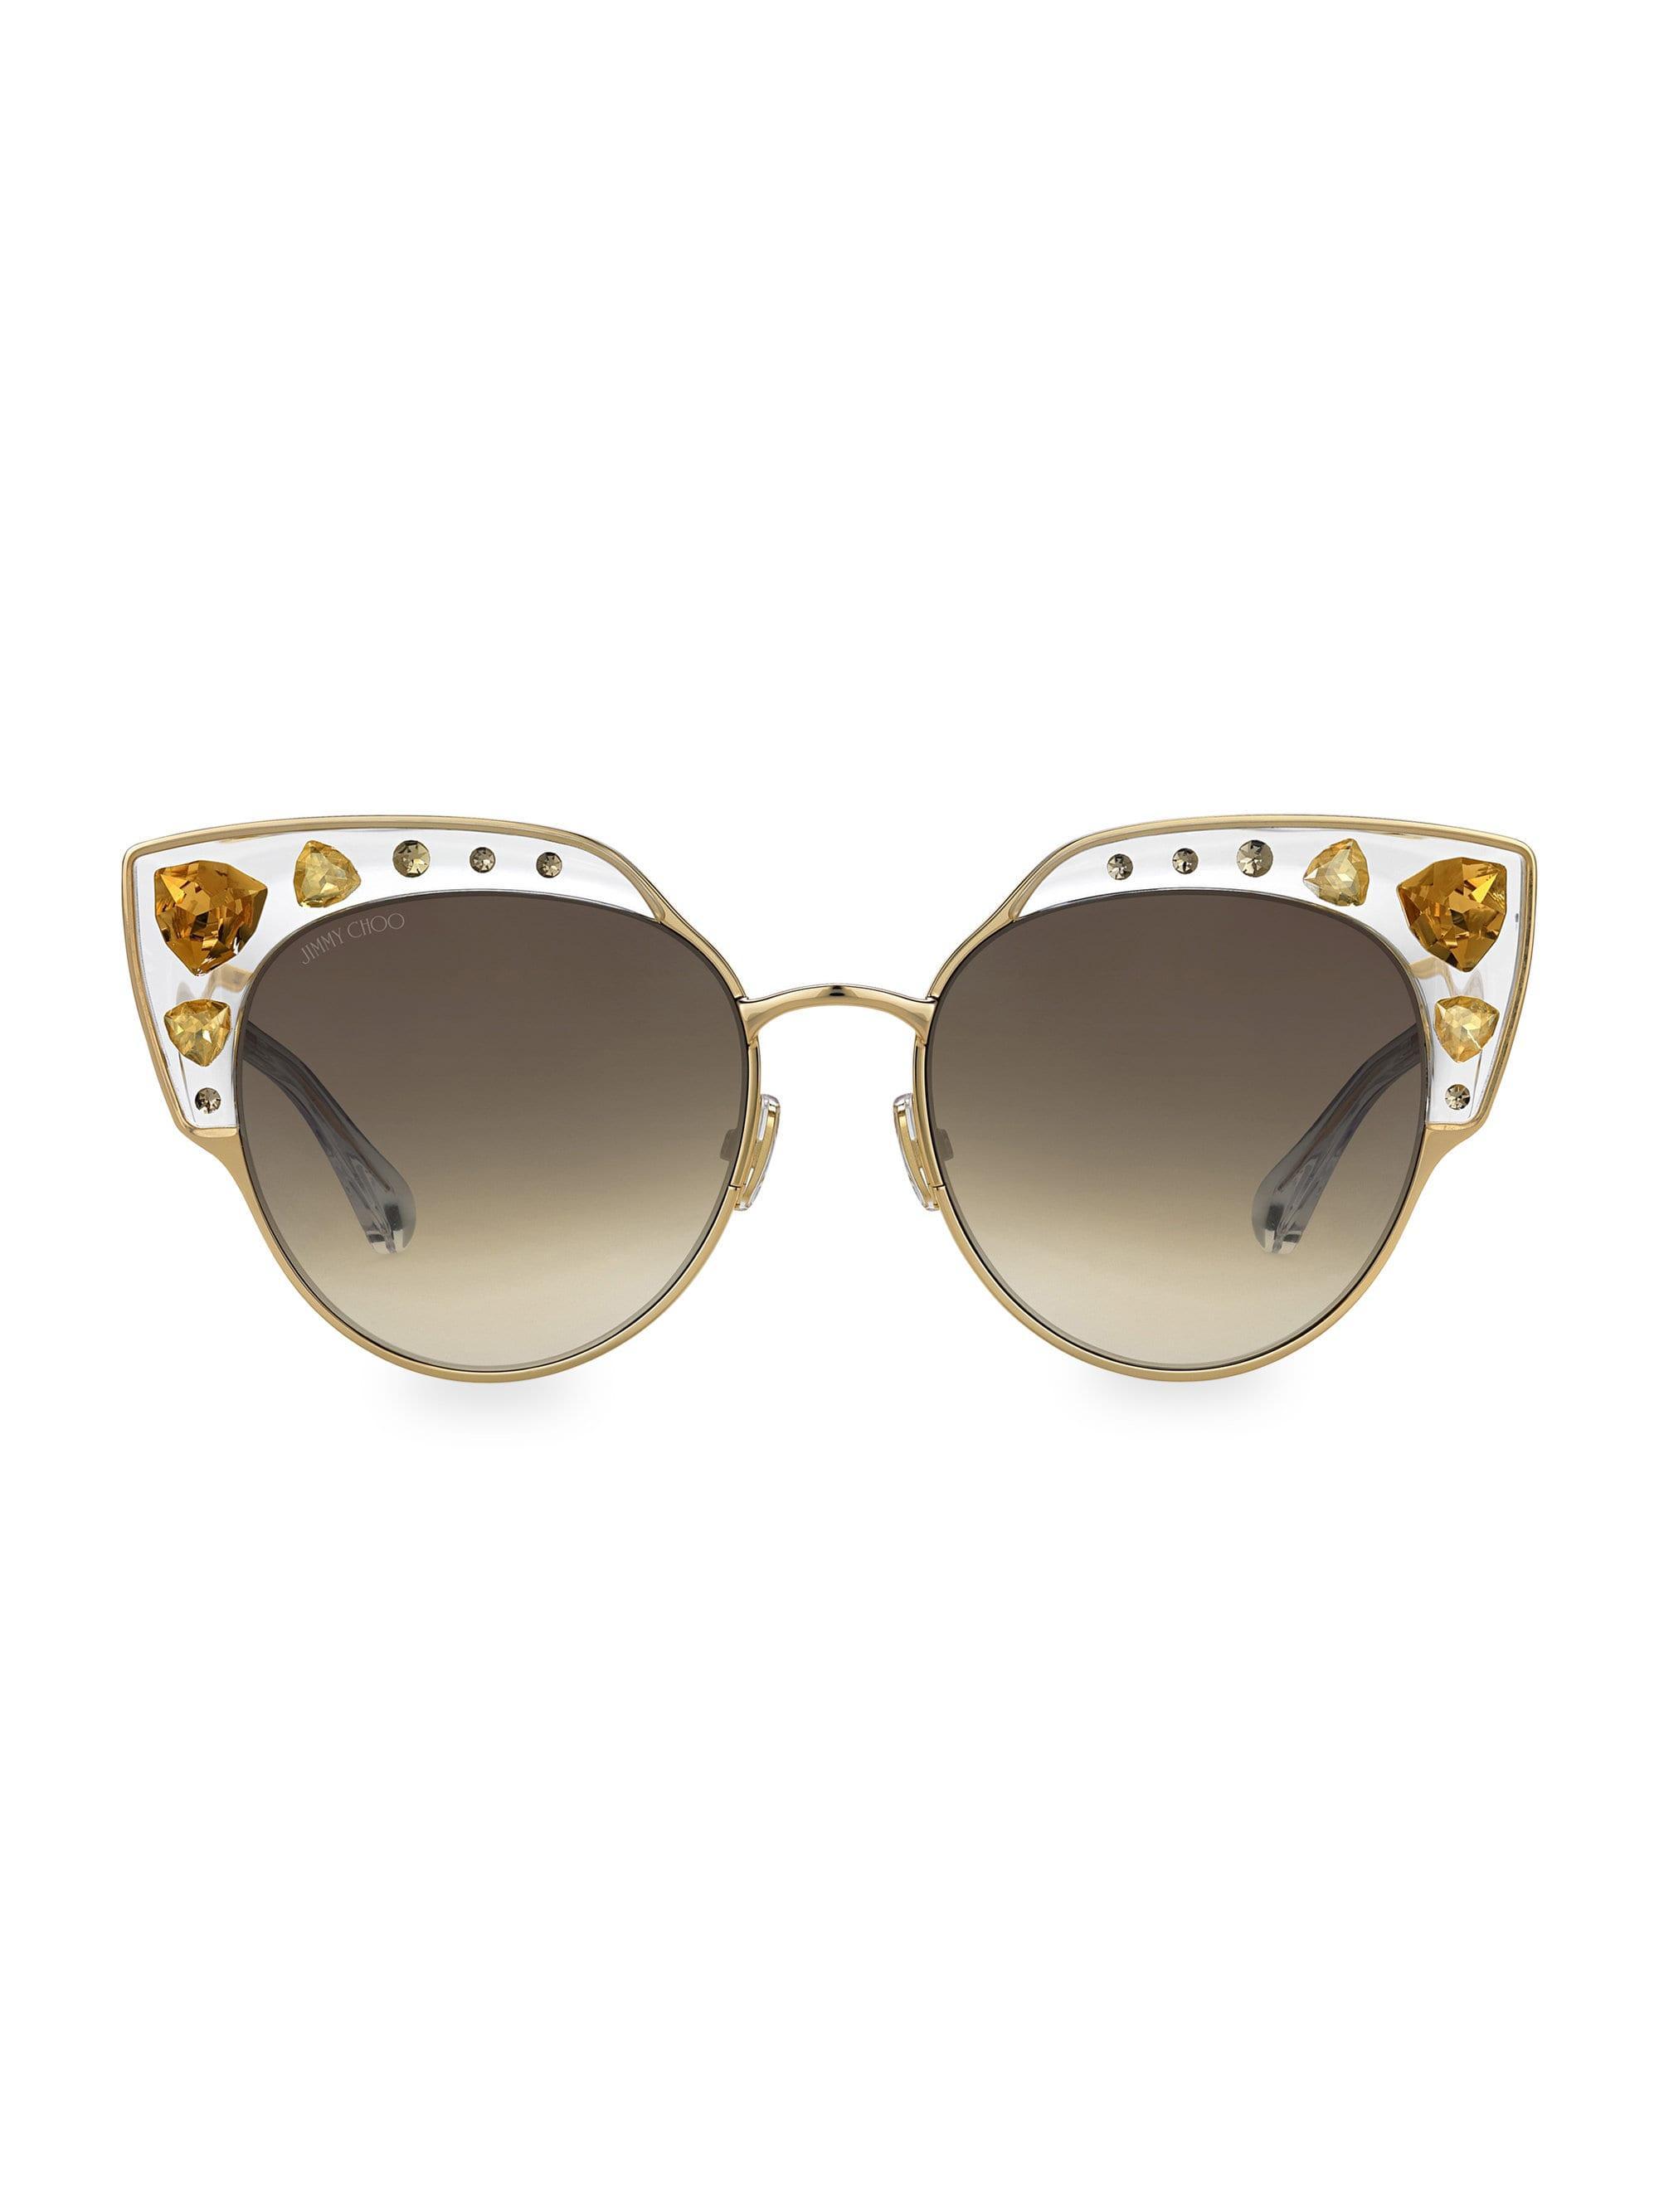 c6cb8bd2586 Lyst - Jimmy Choo Women s Audrey 54mm Cat Eye Sunglasses - Gold in ...